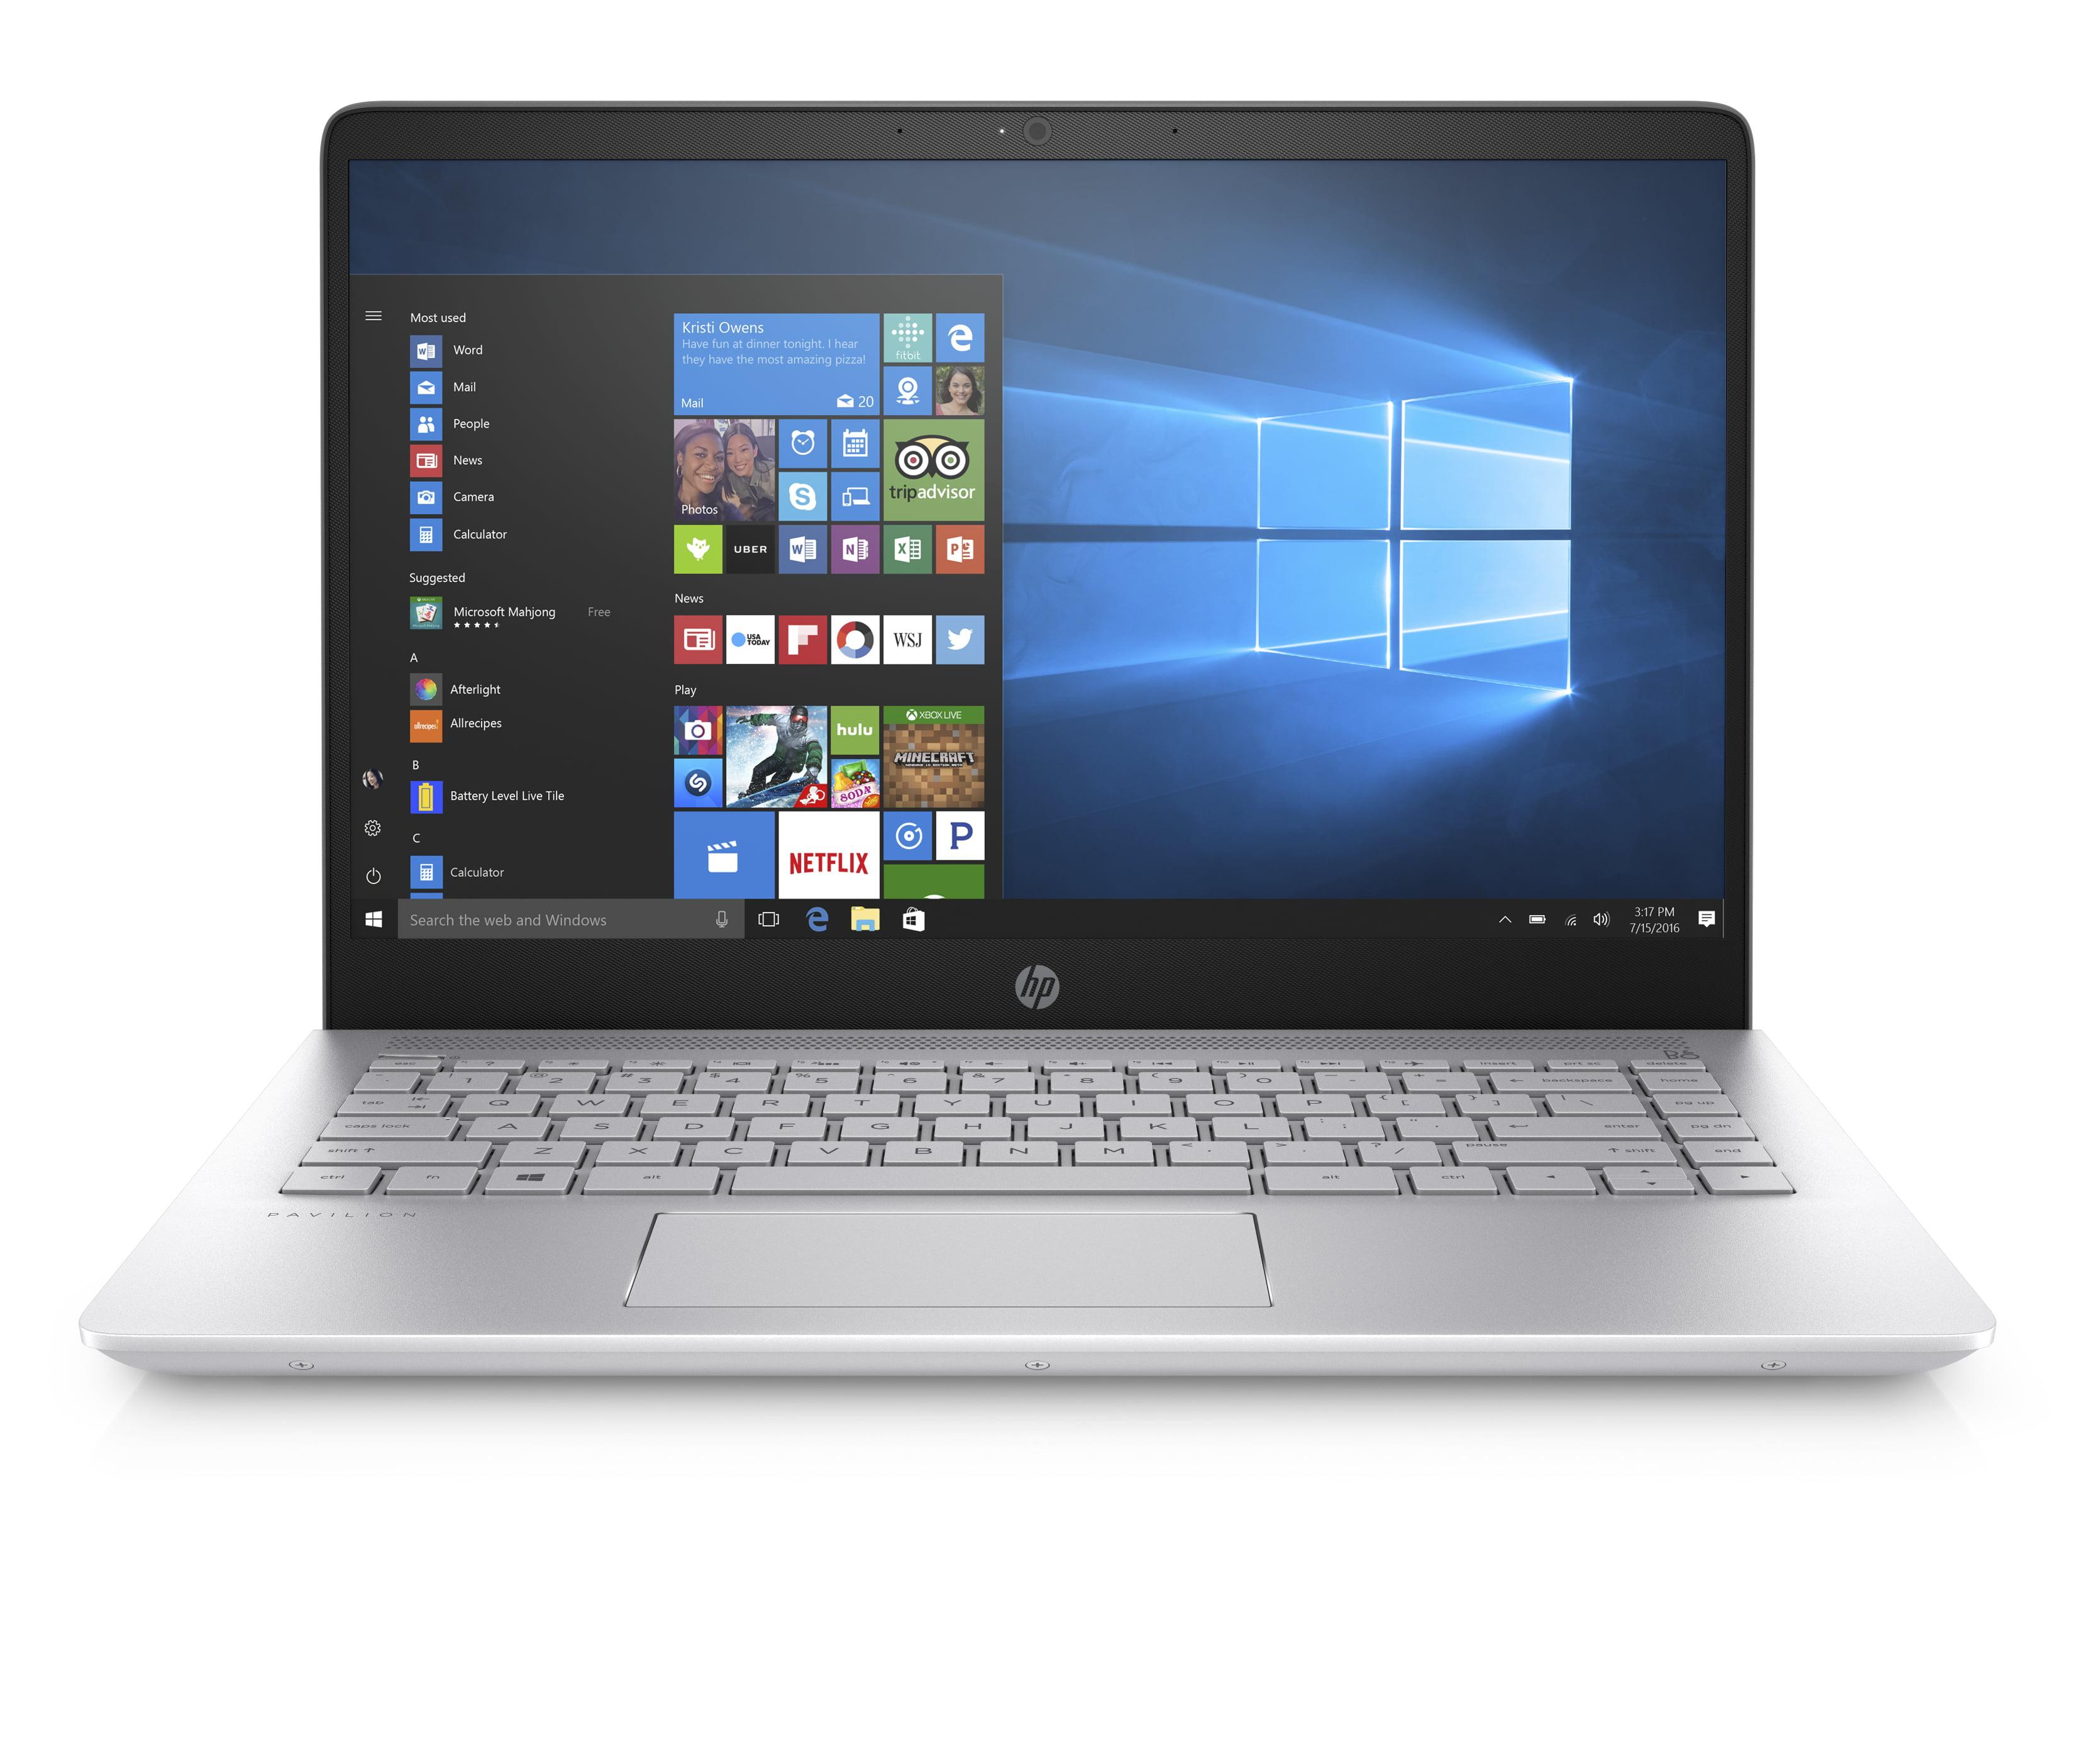 HP Eclipse Ci5 14-bf050wm 14� Laptop, Full HD IPS Mico Edge Display, Intel Core i5-7200U Processor, 8GB... by HP